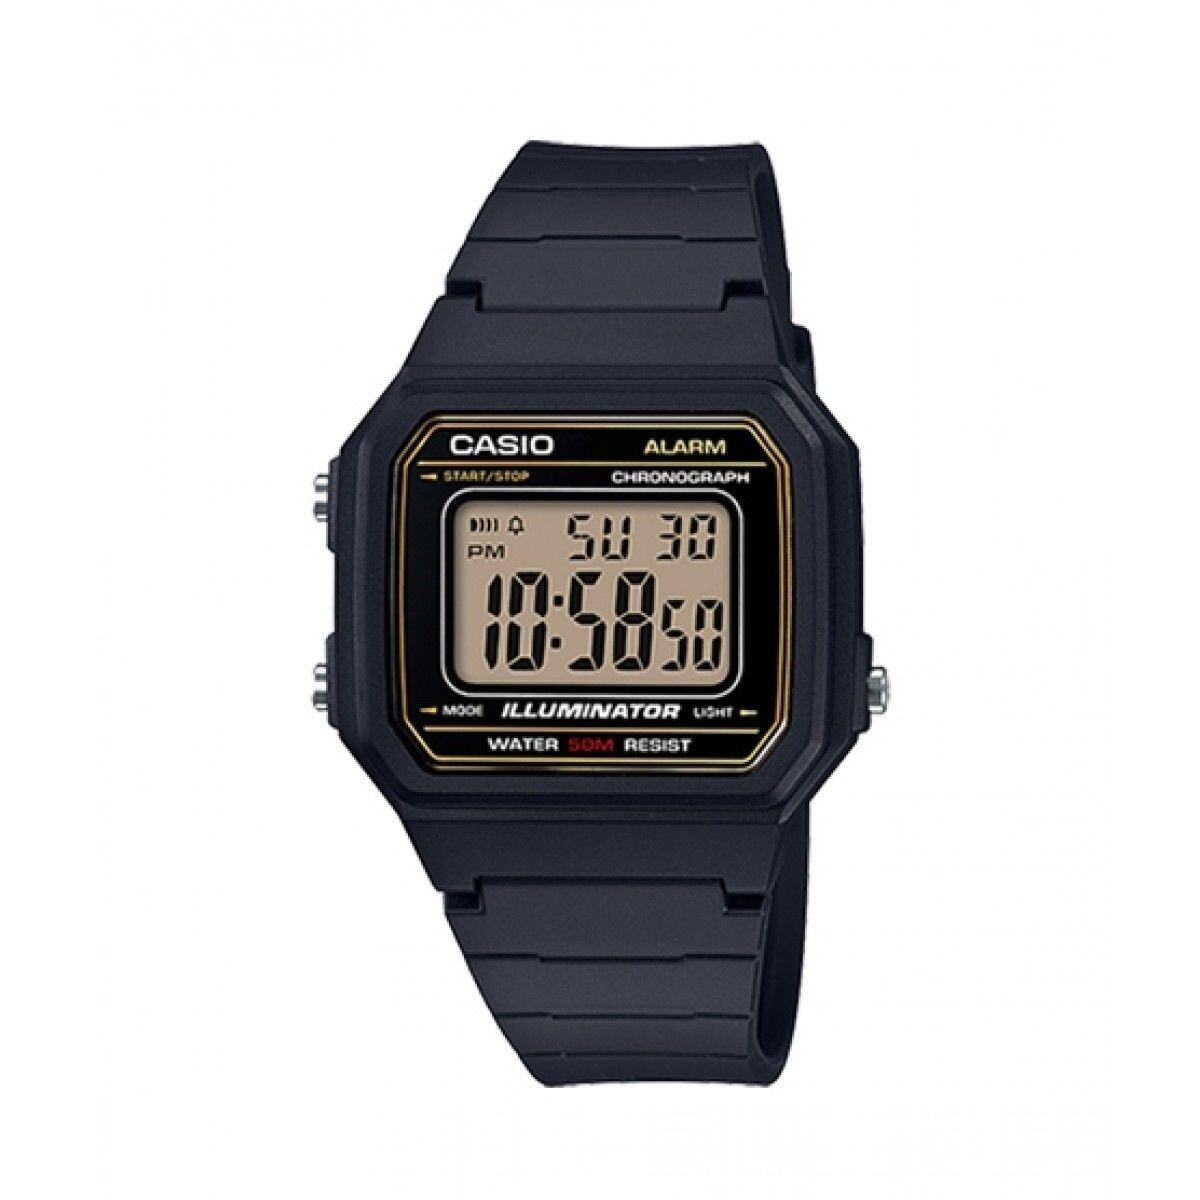 Reloj hombre militar Casio W217H-9AV correa goma negra